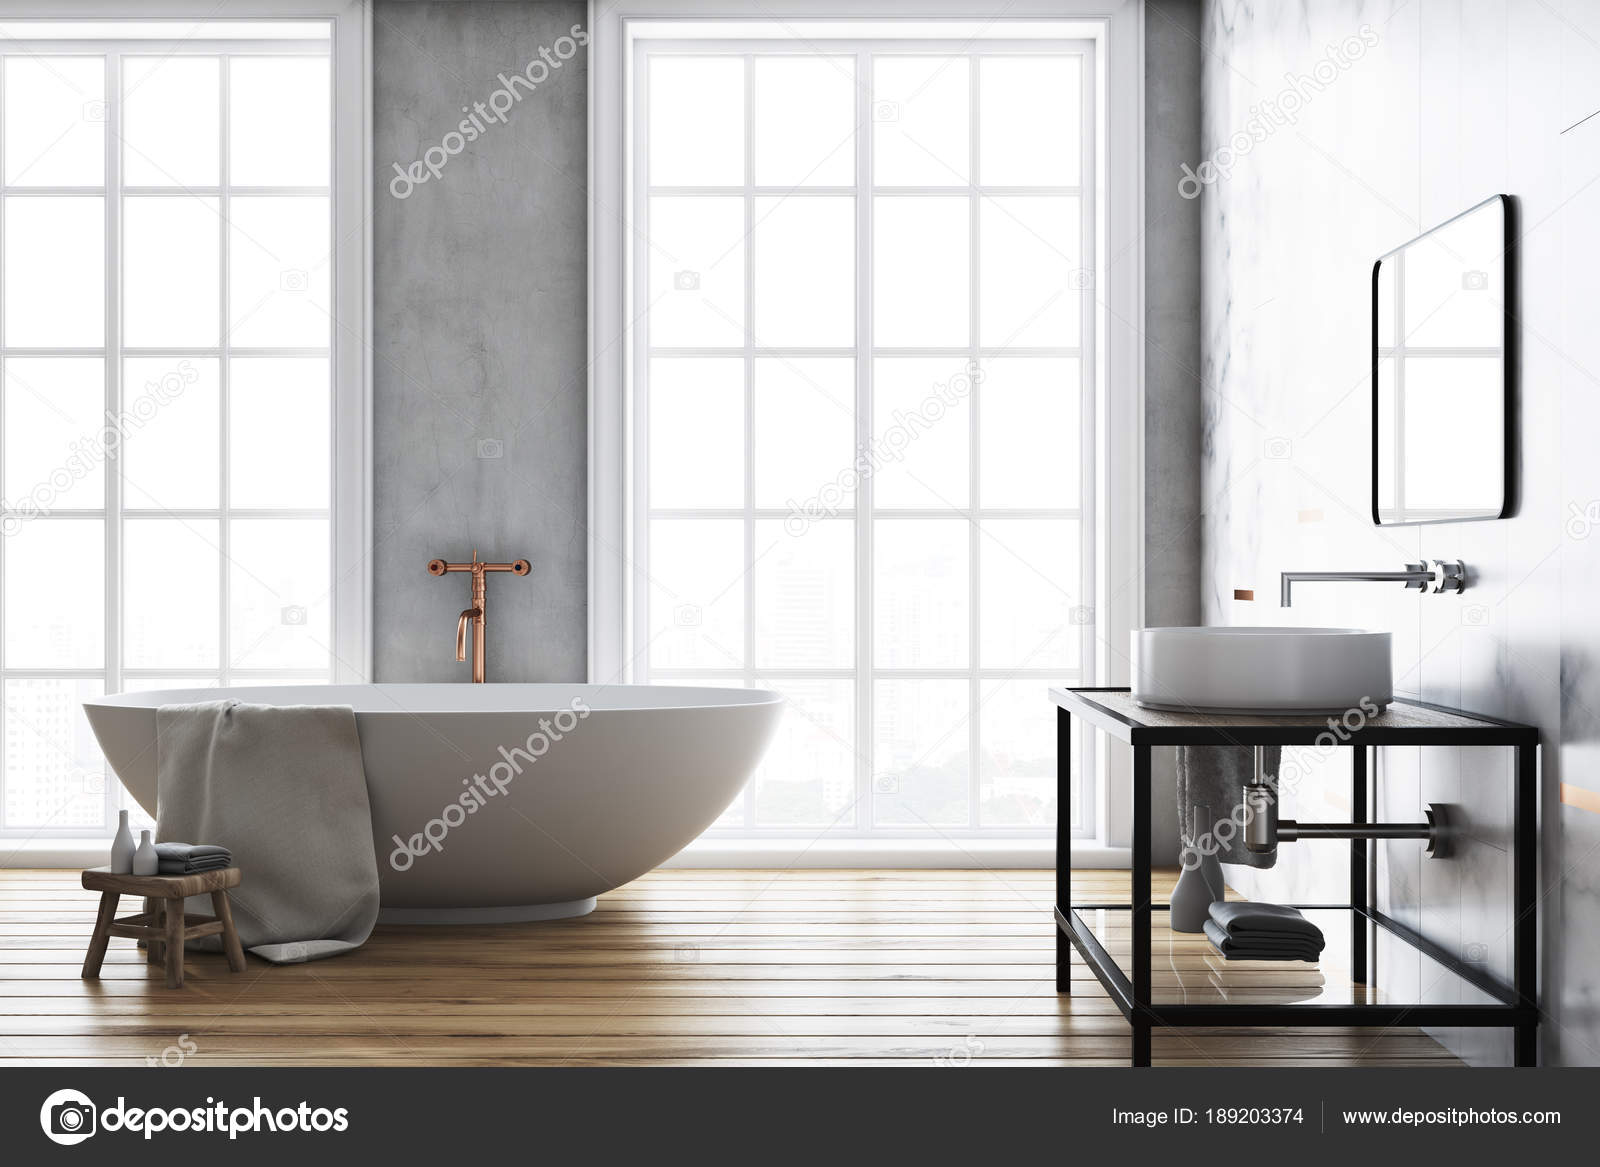 Luxe beton badkamer interieur — Stockfoto © denisismagilov #189203374